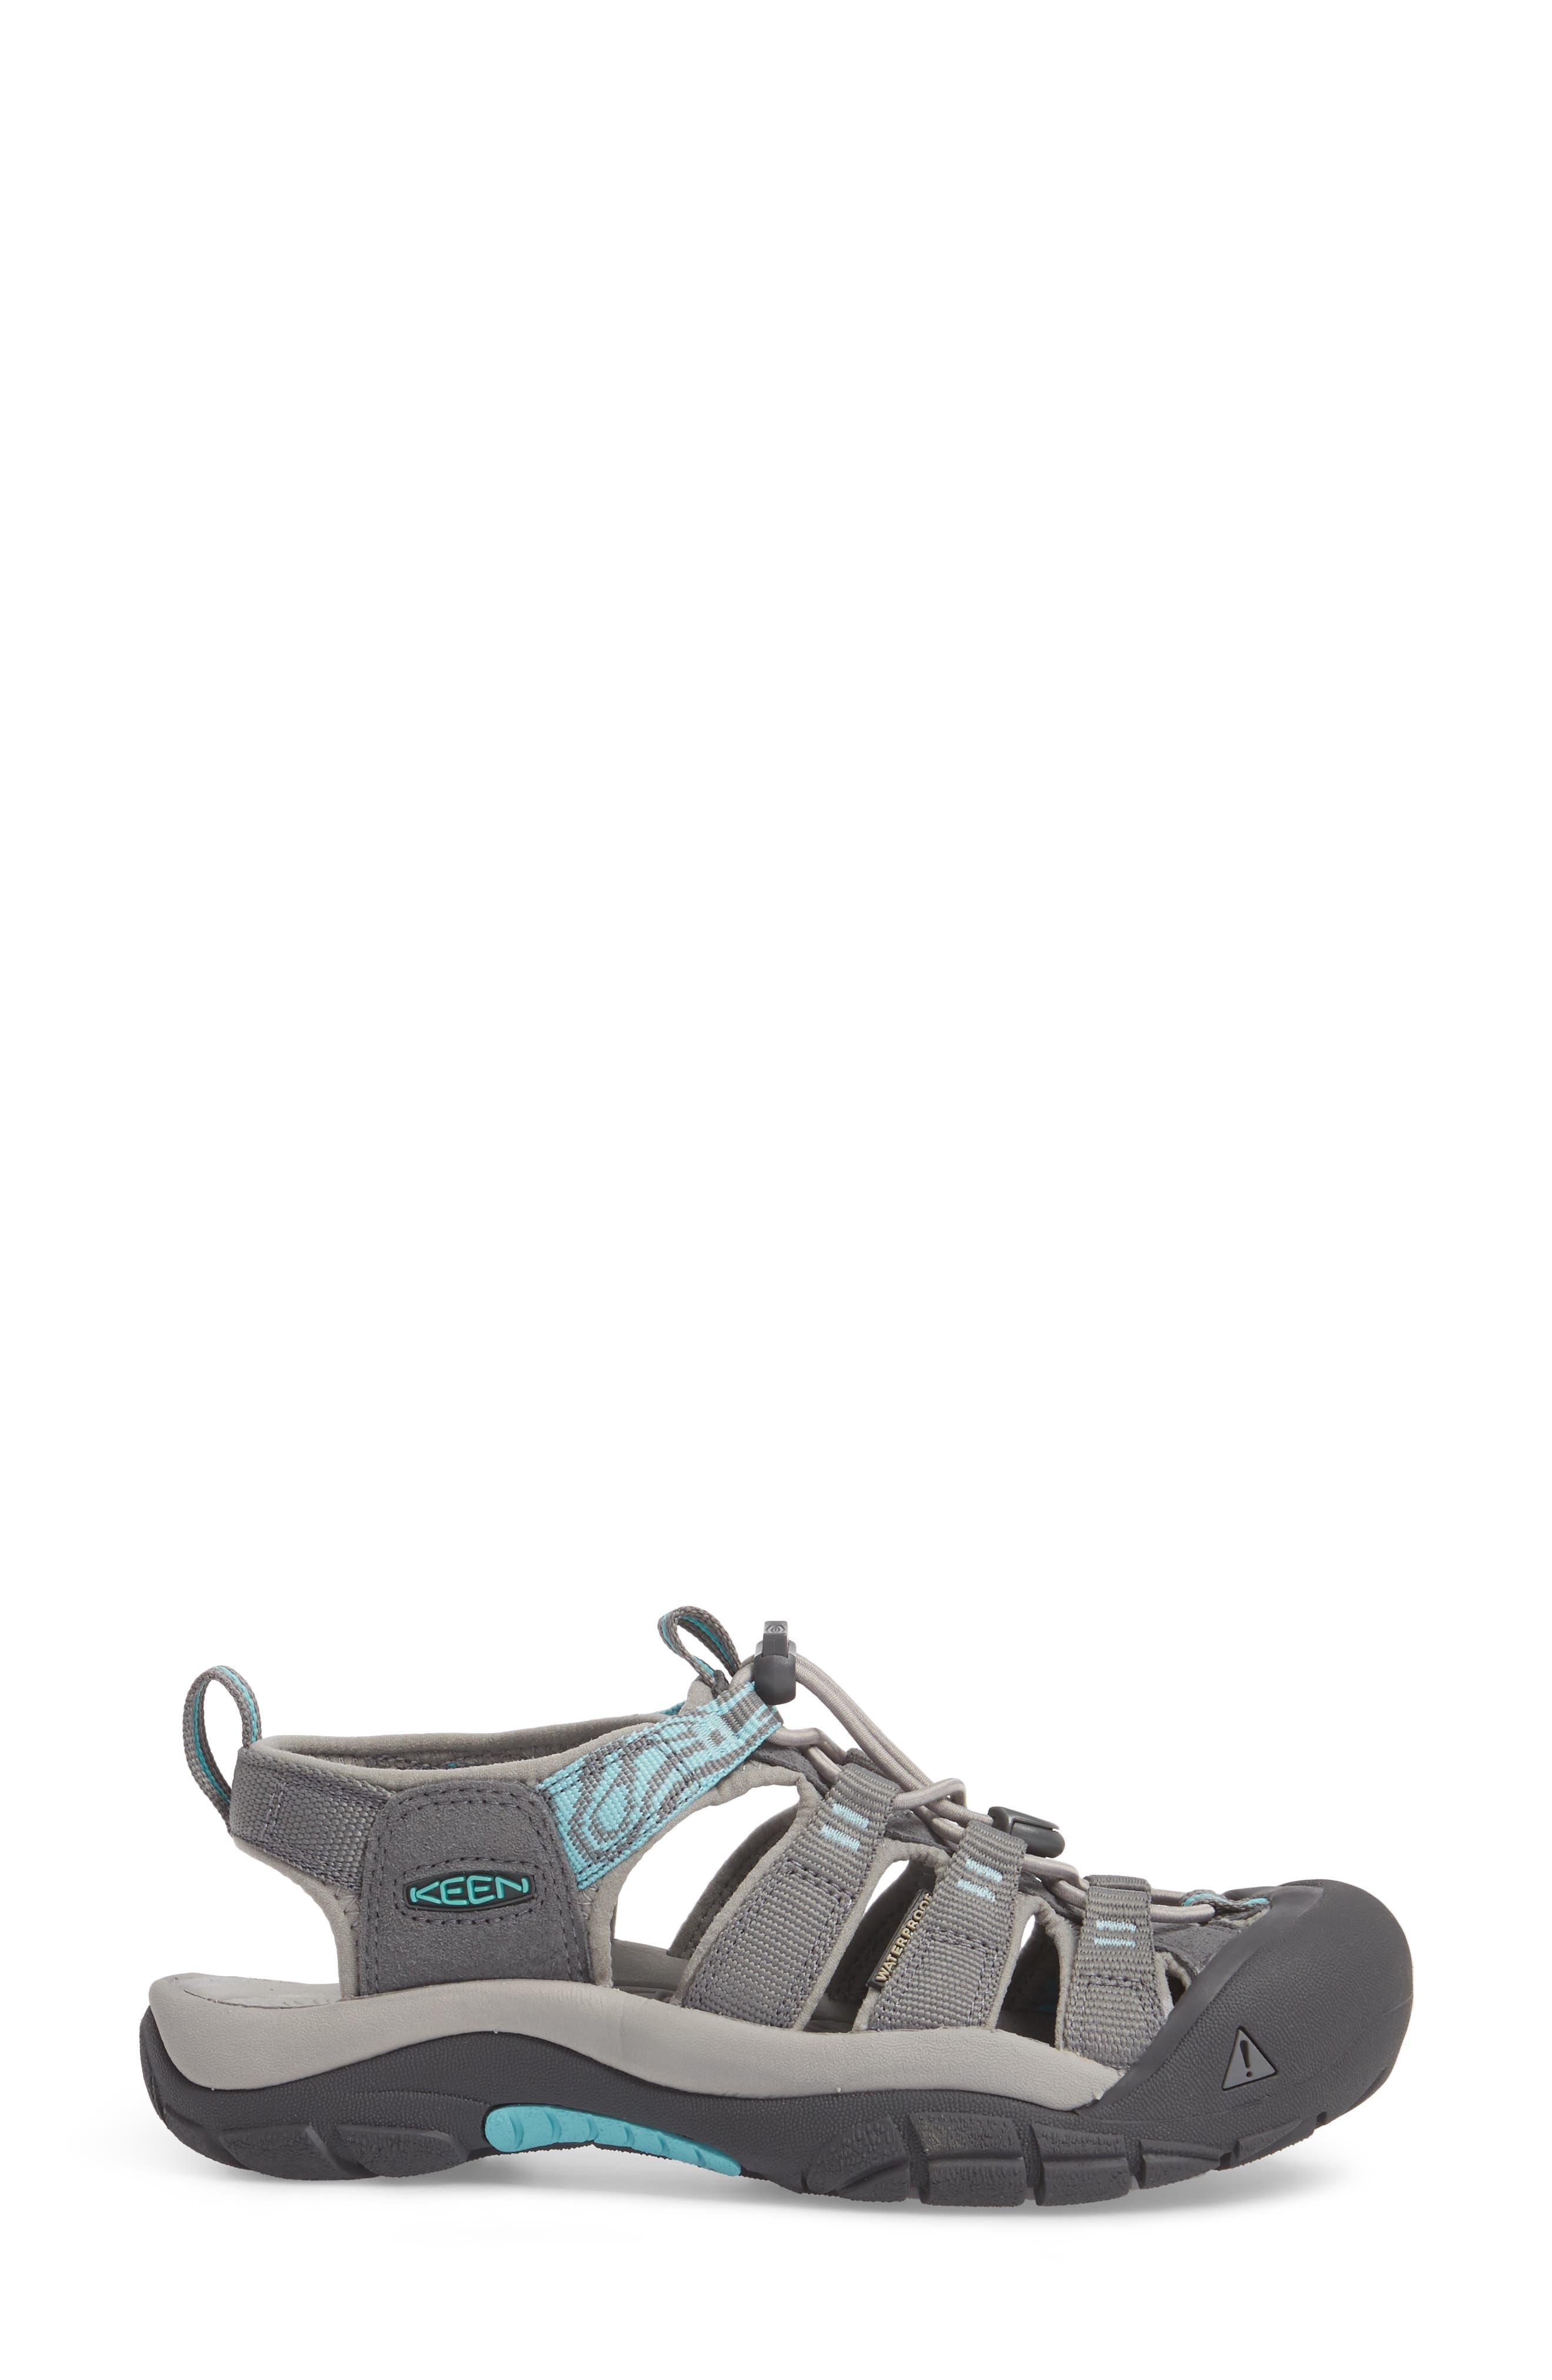 Newport Hydro Sandal,                             Alternate thumbnail 3, color,                             STEEL GREY/ BLUE TURQUOISE